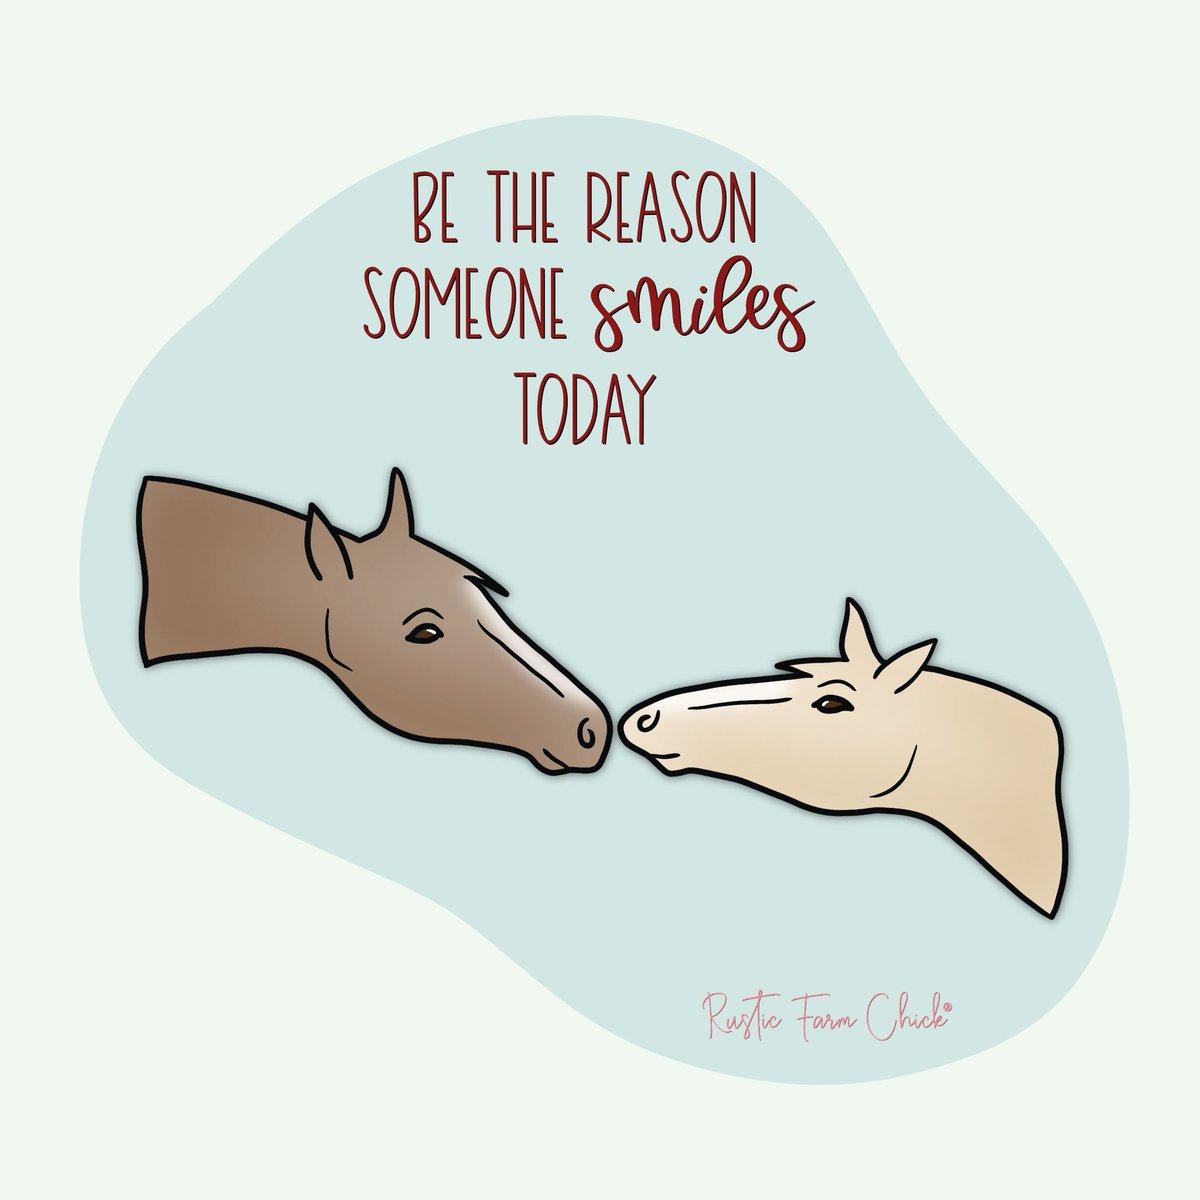 Be the reason someone #smiles today! Sharing some #positivevibes. Have a fabulous day!  #havefun #laugh #besafe #behappy #artistsontwitter #procreateart #crafters #becreative #illustrator #bethechange #handdrawnart #digitalart #etsyartist #creativelifehappylife #spokanewapic.twitter.com/aaTMmGKvAl